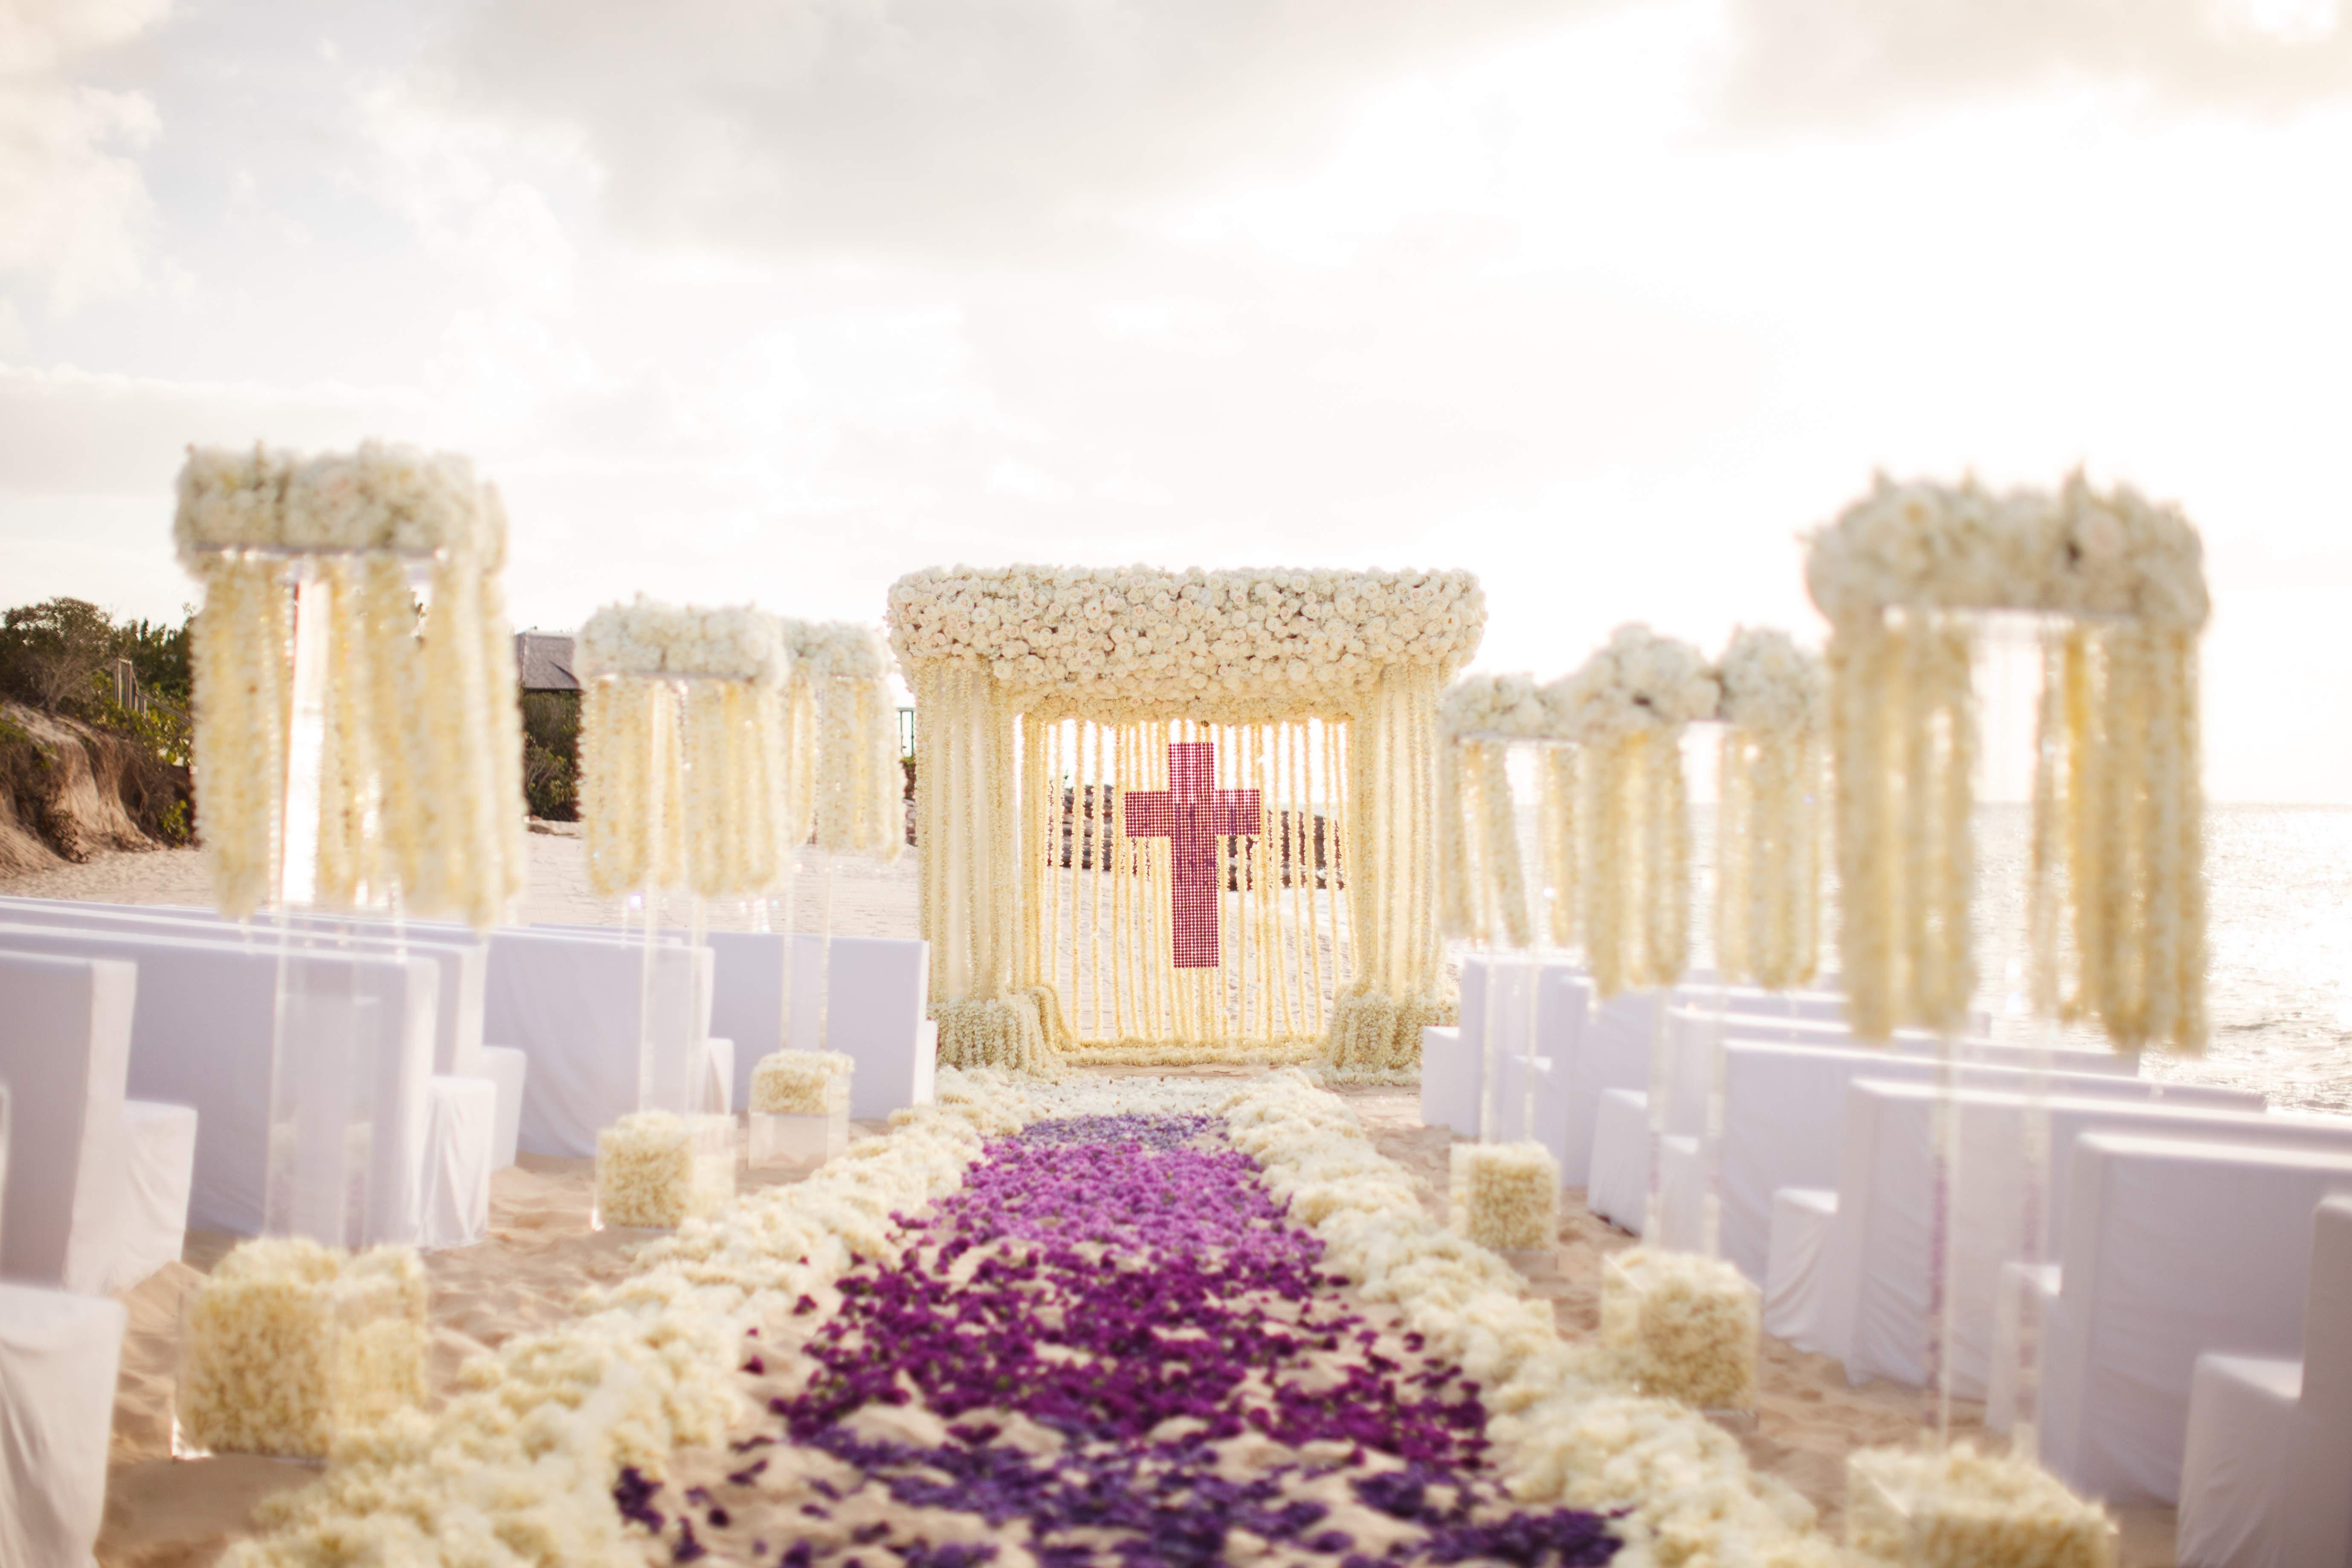 wedding ideas beautiful ceremony floral aisle runner designs